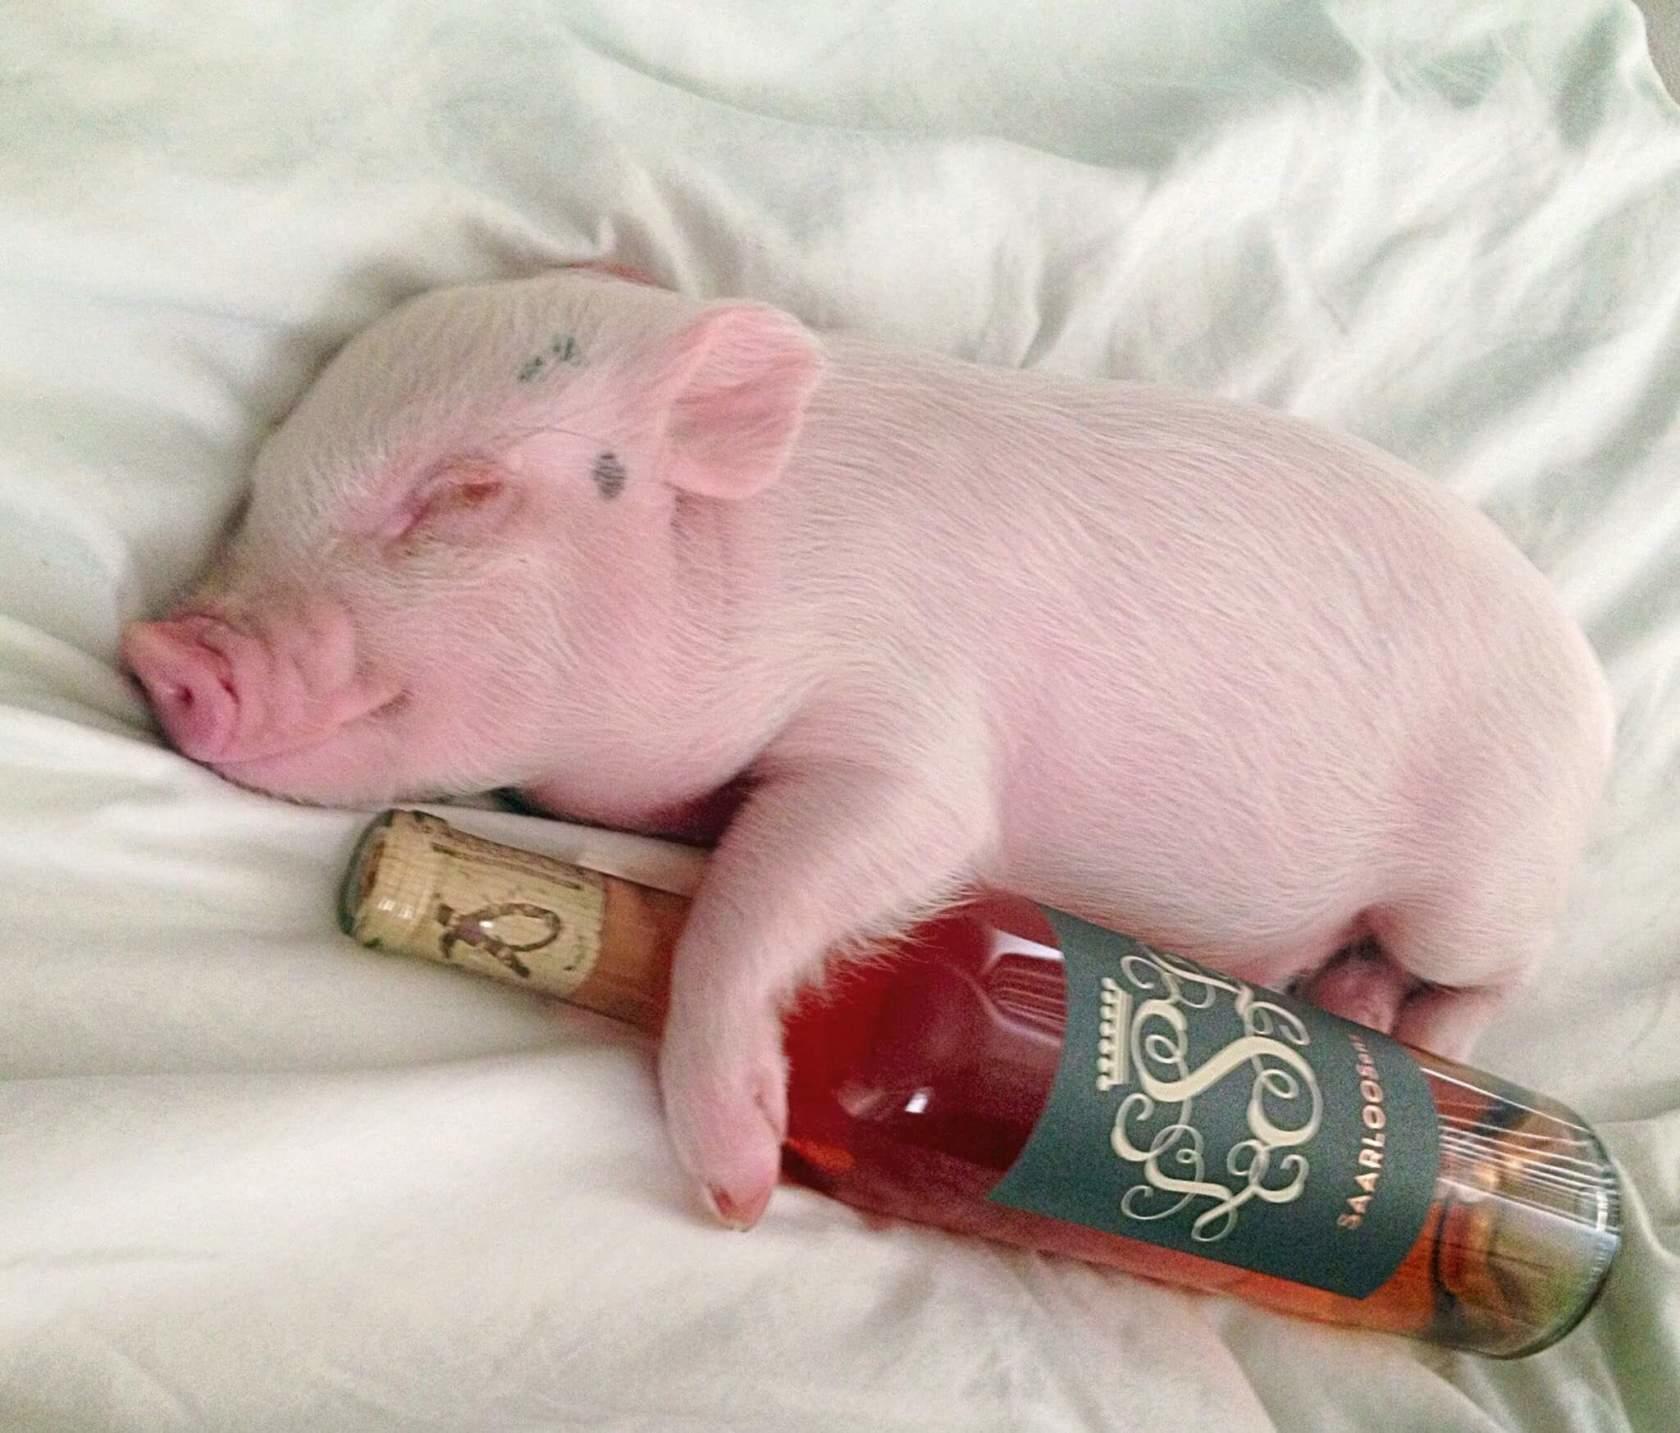 Для, приколы картинки со свиньями